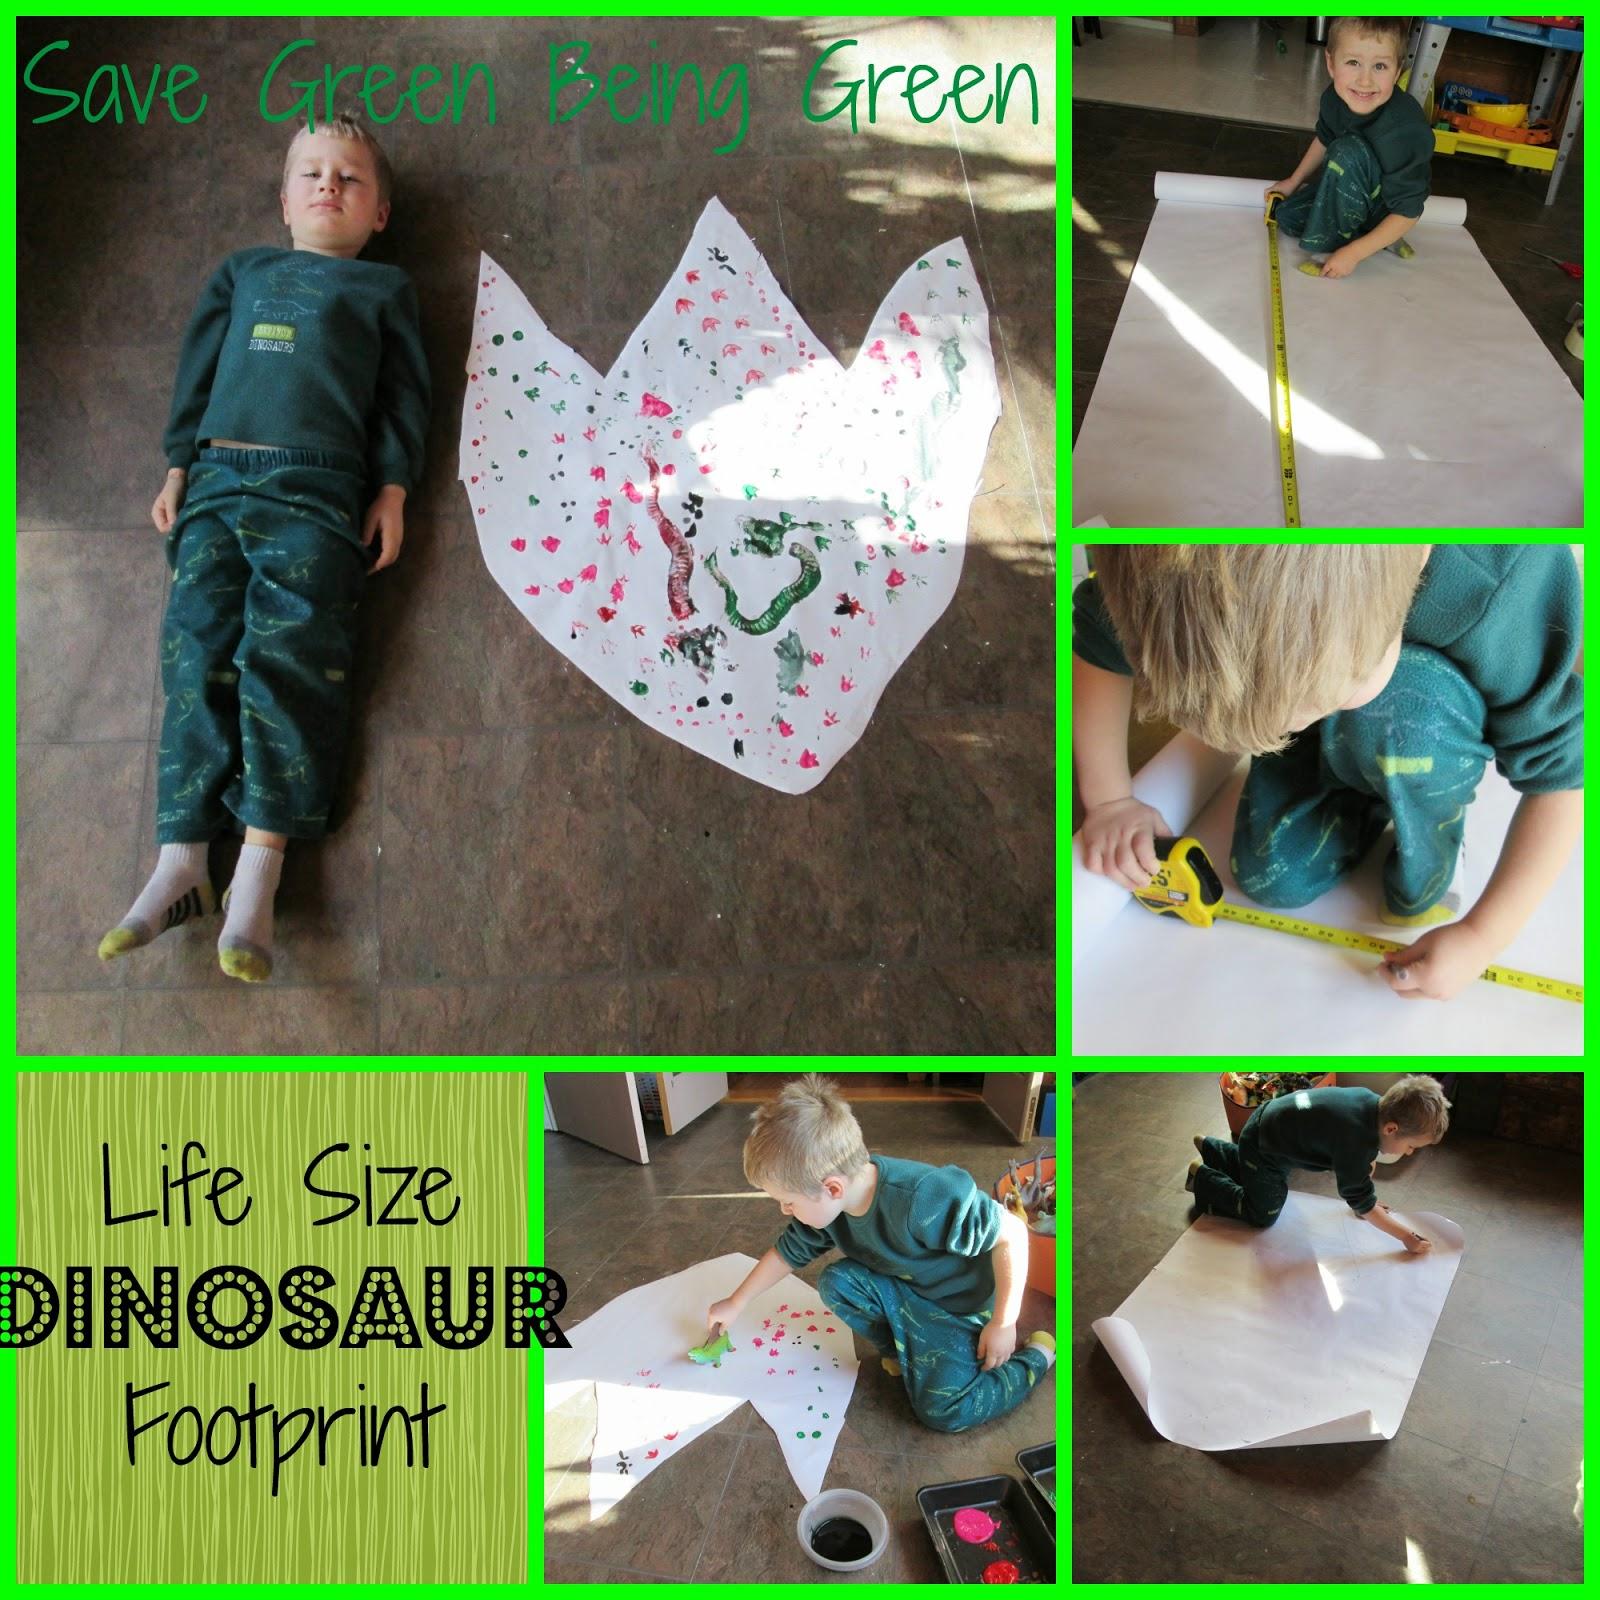 Life Size Dinosaur Foot Print Project